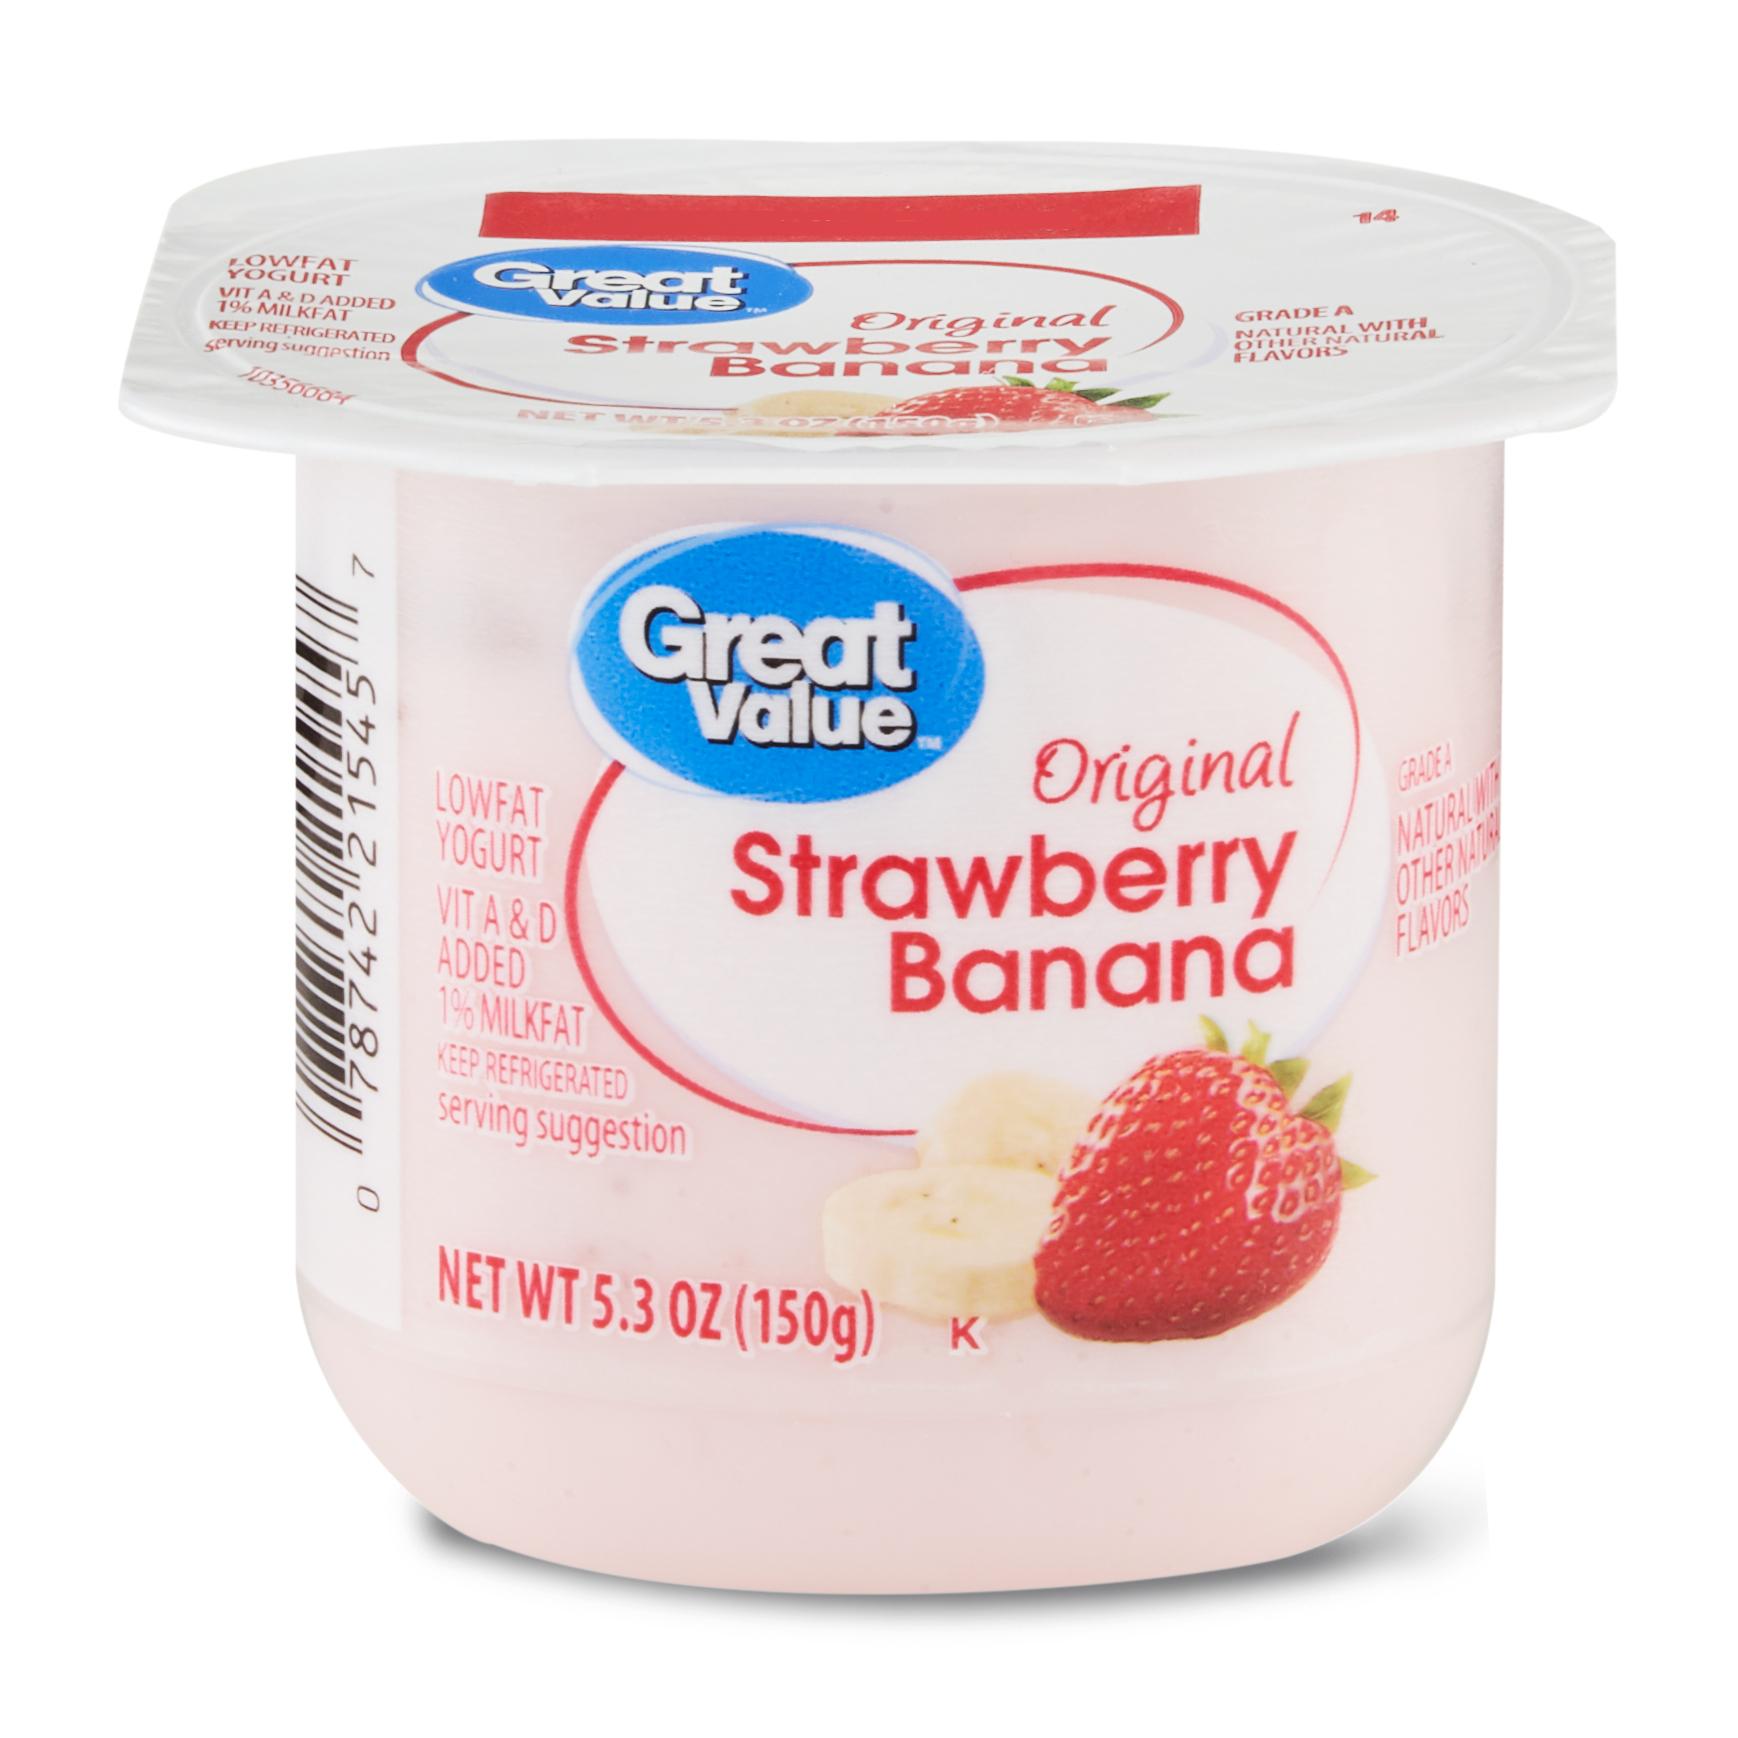 Great Value Original Strawberry Banana Lowfat Yogurt, 5.3 oz